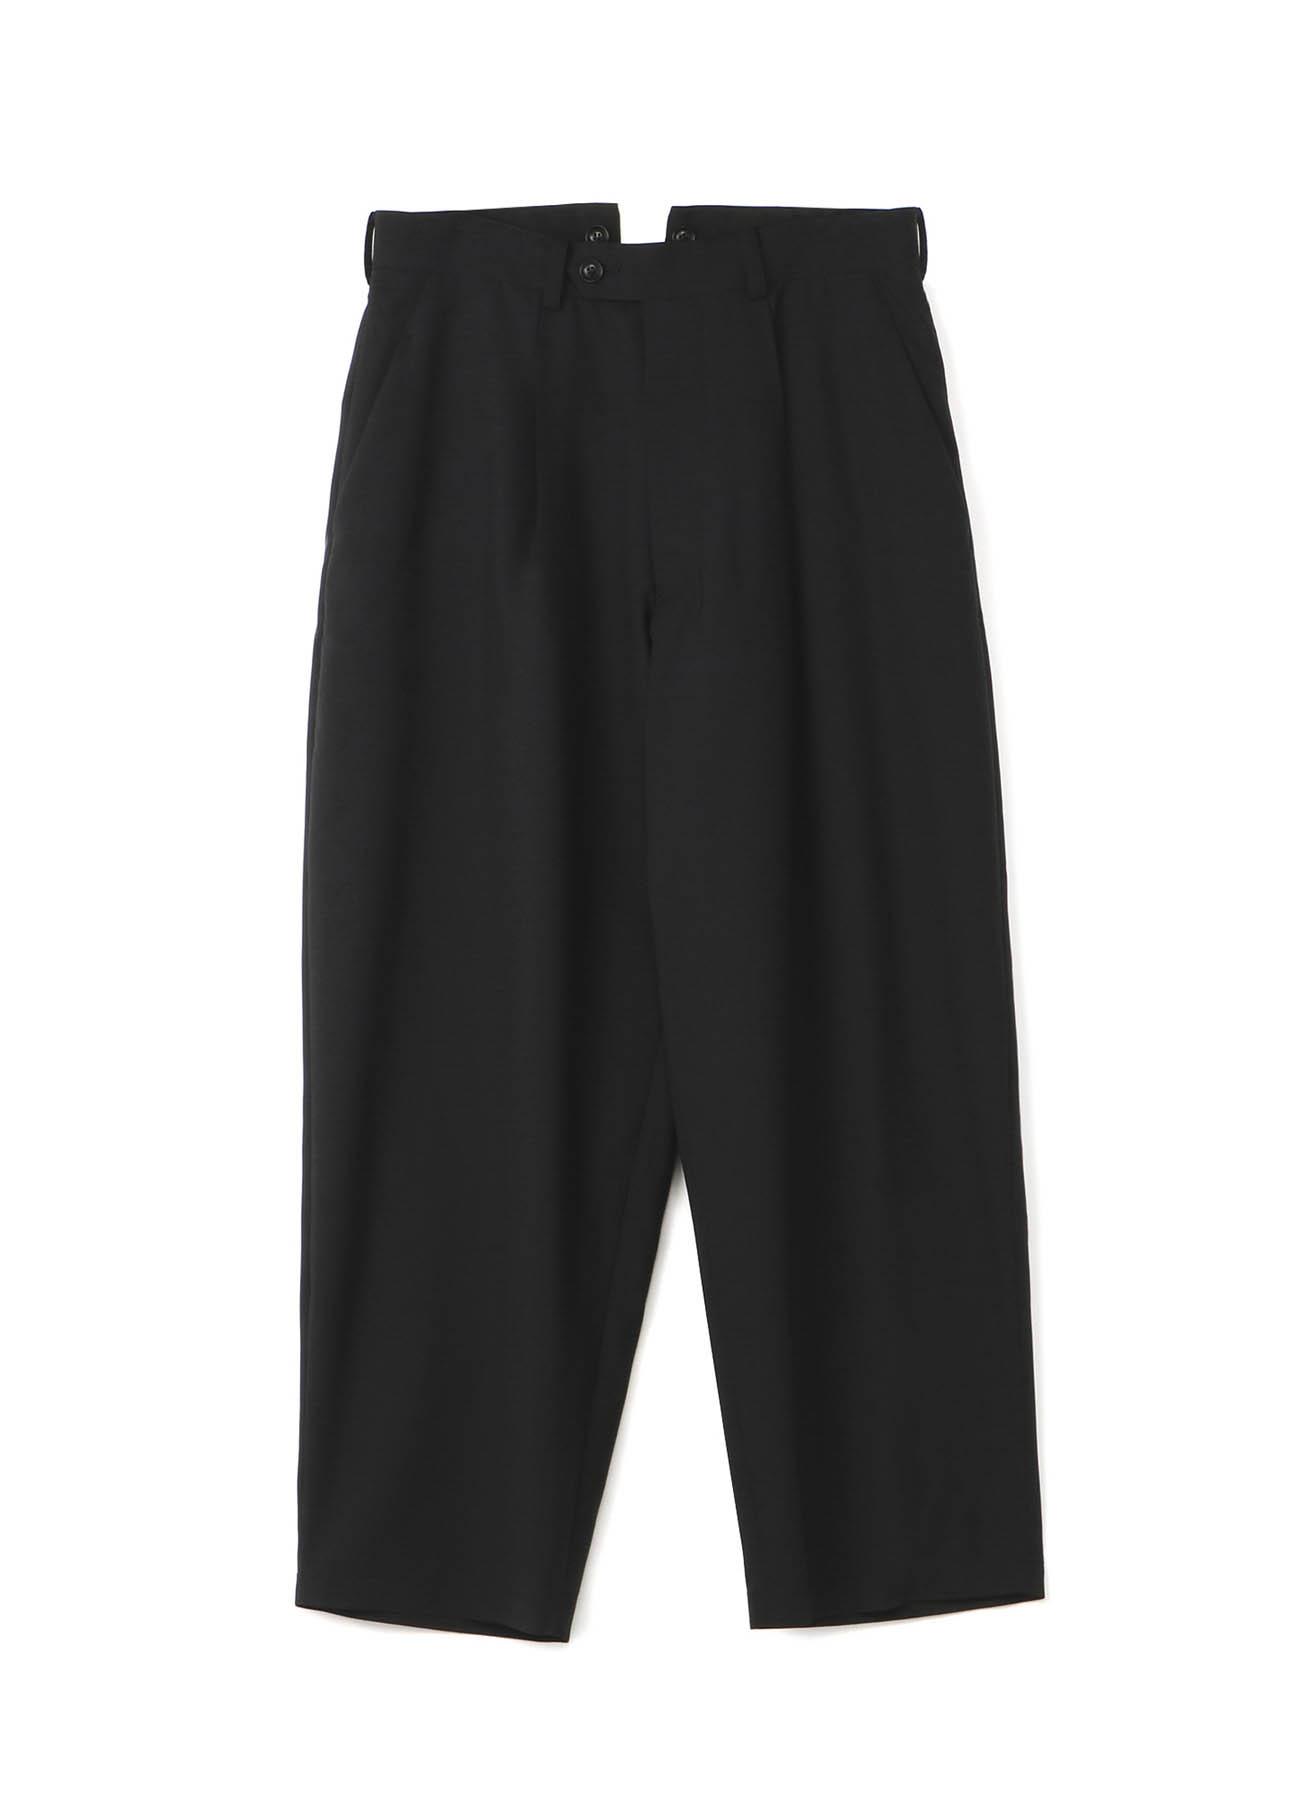 No.19 夏季羊毛收腿裤